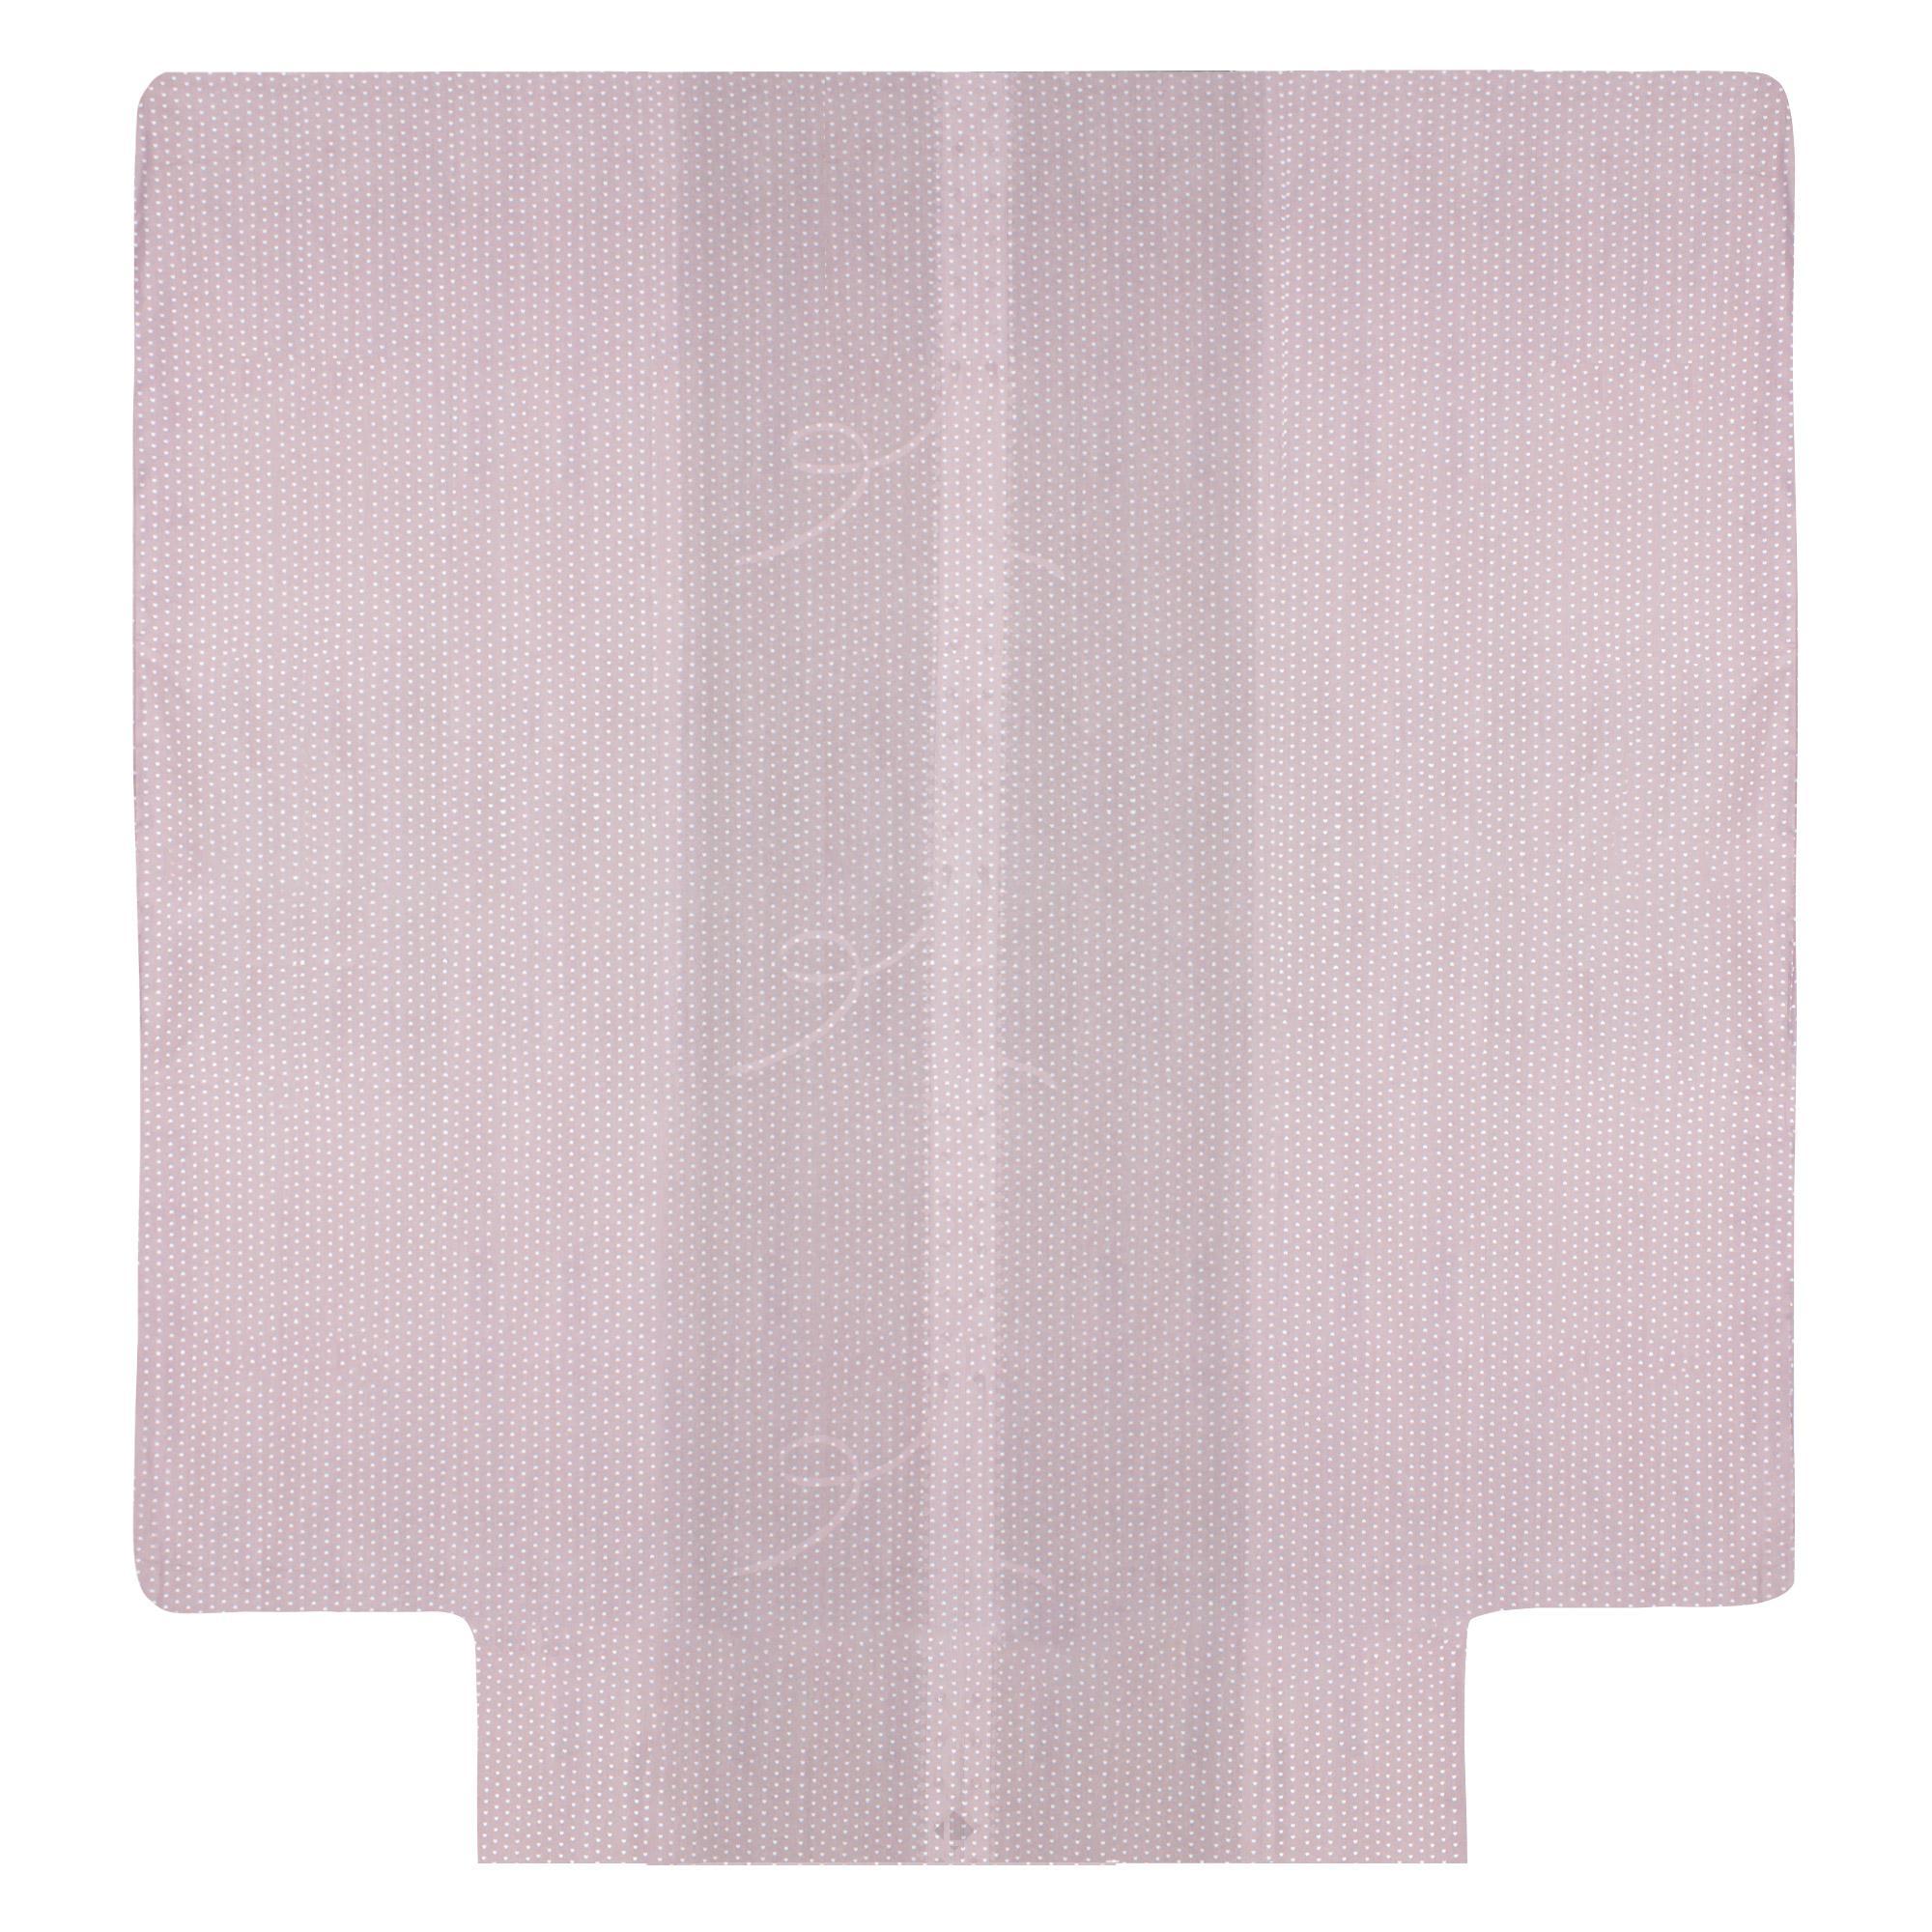 housse de couette 260x240 100 coton glamour rose ebay. Black Bedroom Furniture Sets. Home Design Ideas